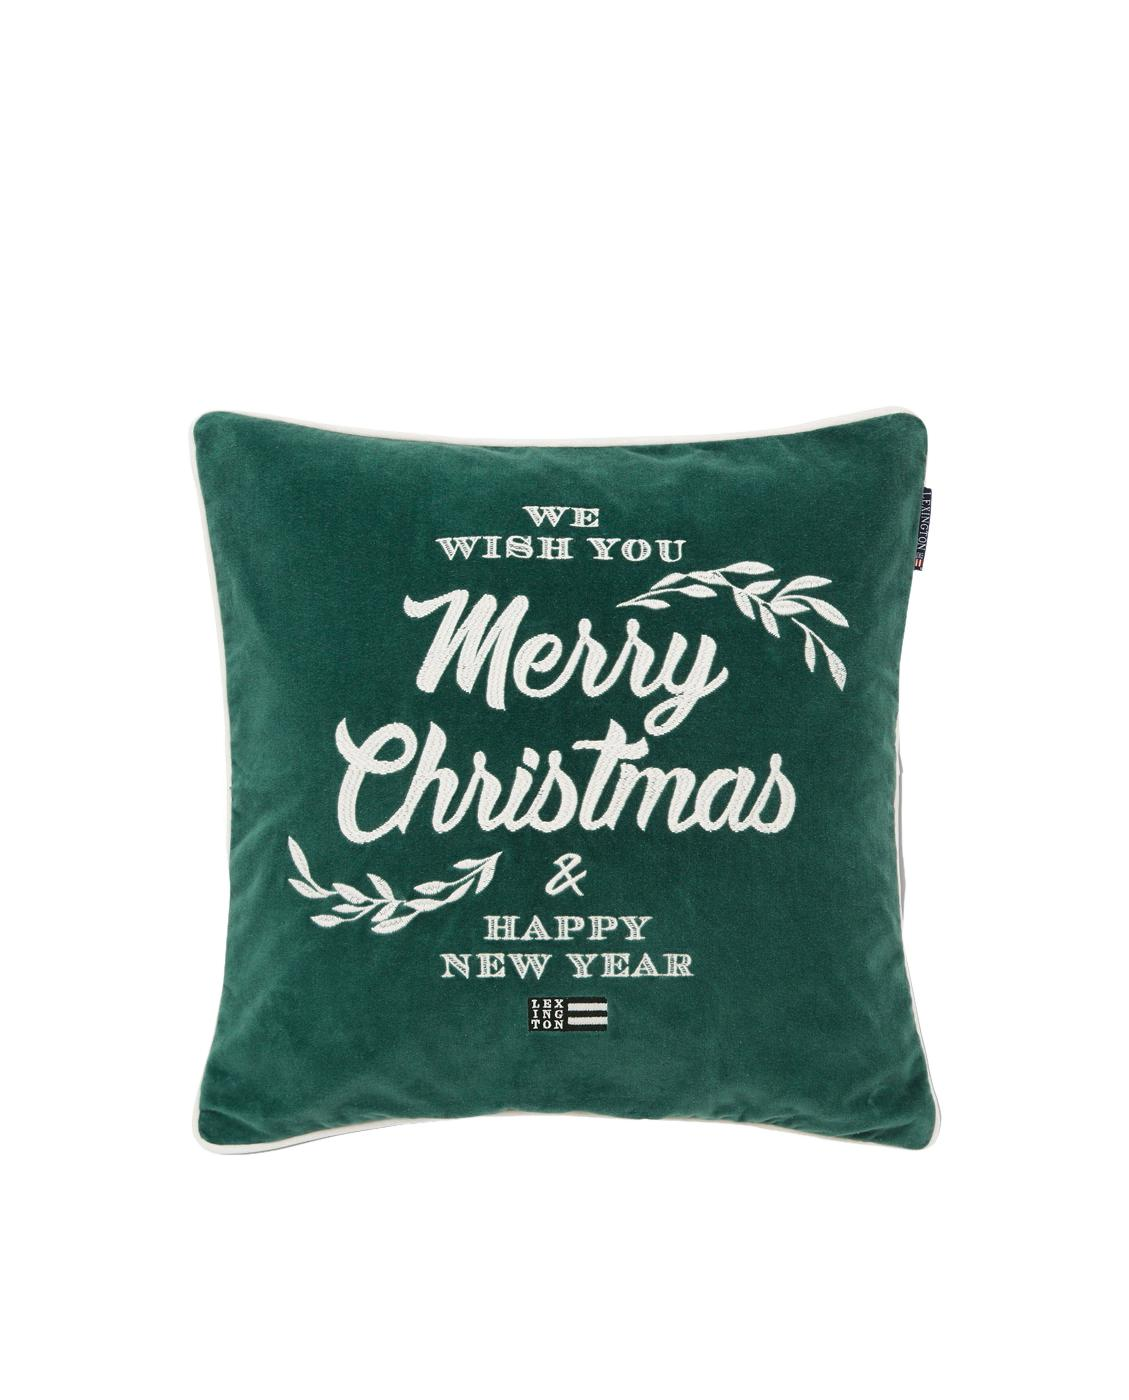 Samt-Kissenhülle Merry Christmas mit Aufschrift, Baumwollsamt, Weiß, Grün, 50 x 50 cm